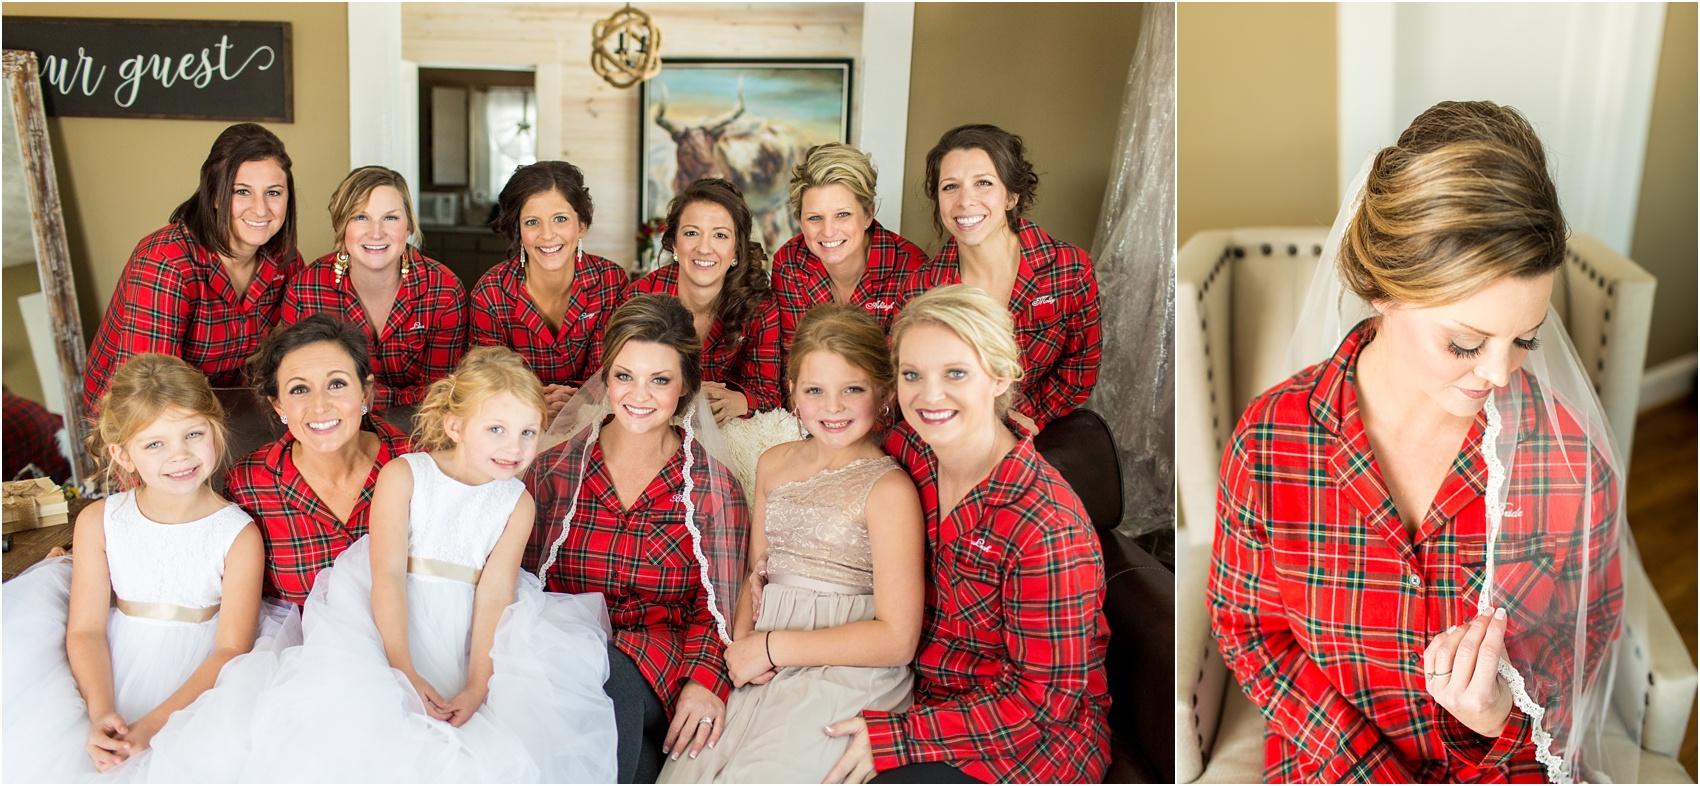 Savannah Eve Photography- Page Wedding Blog-8.jpg